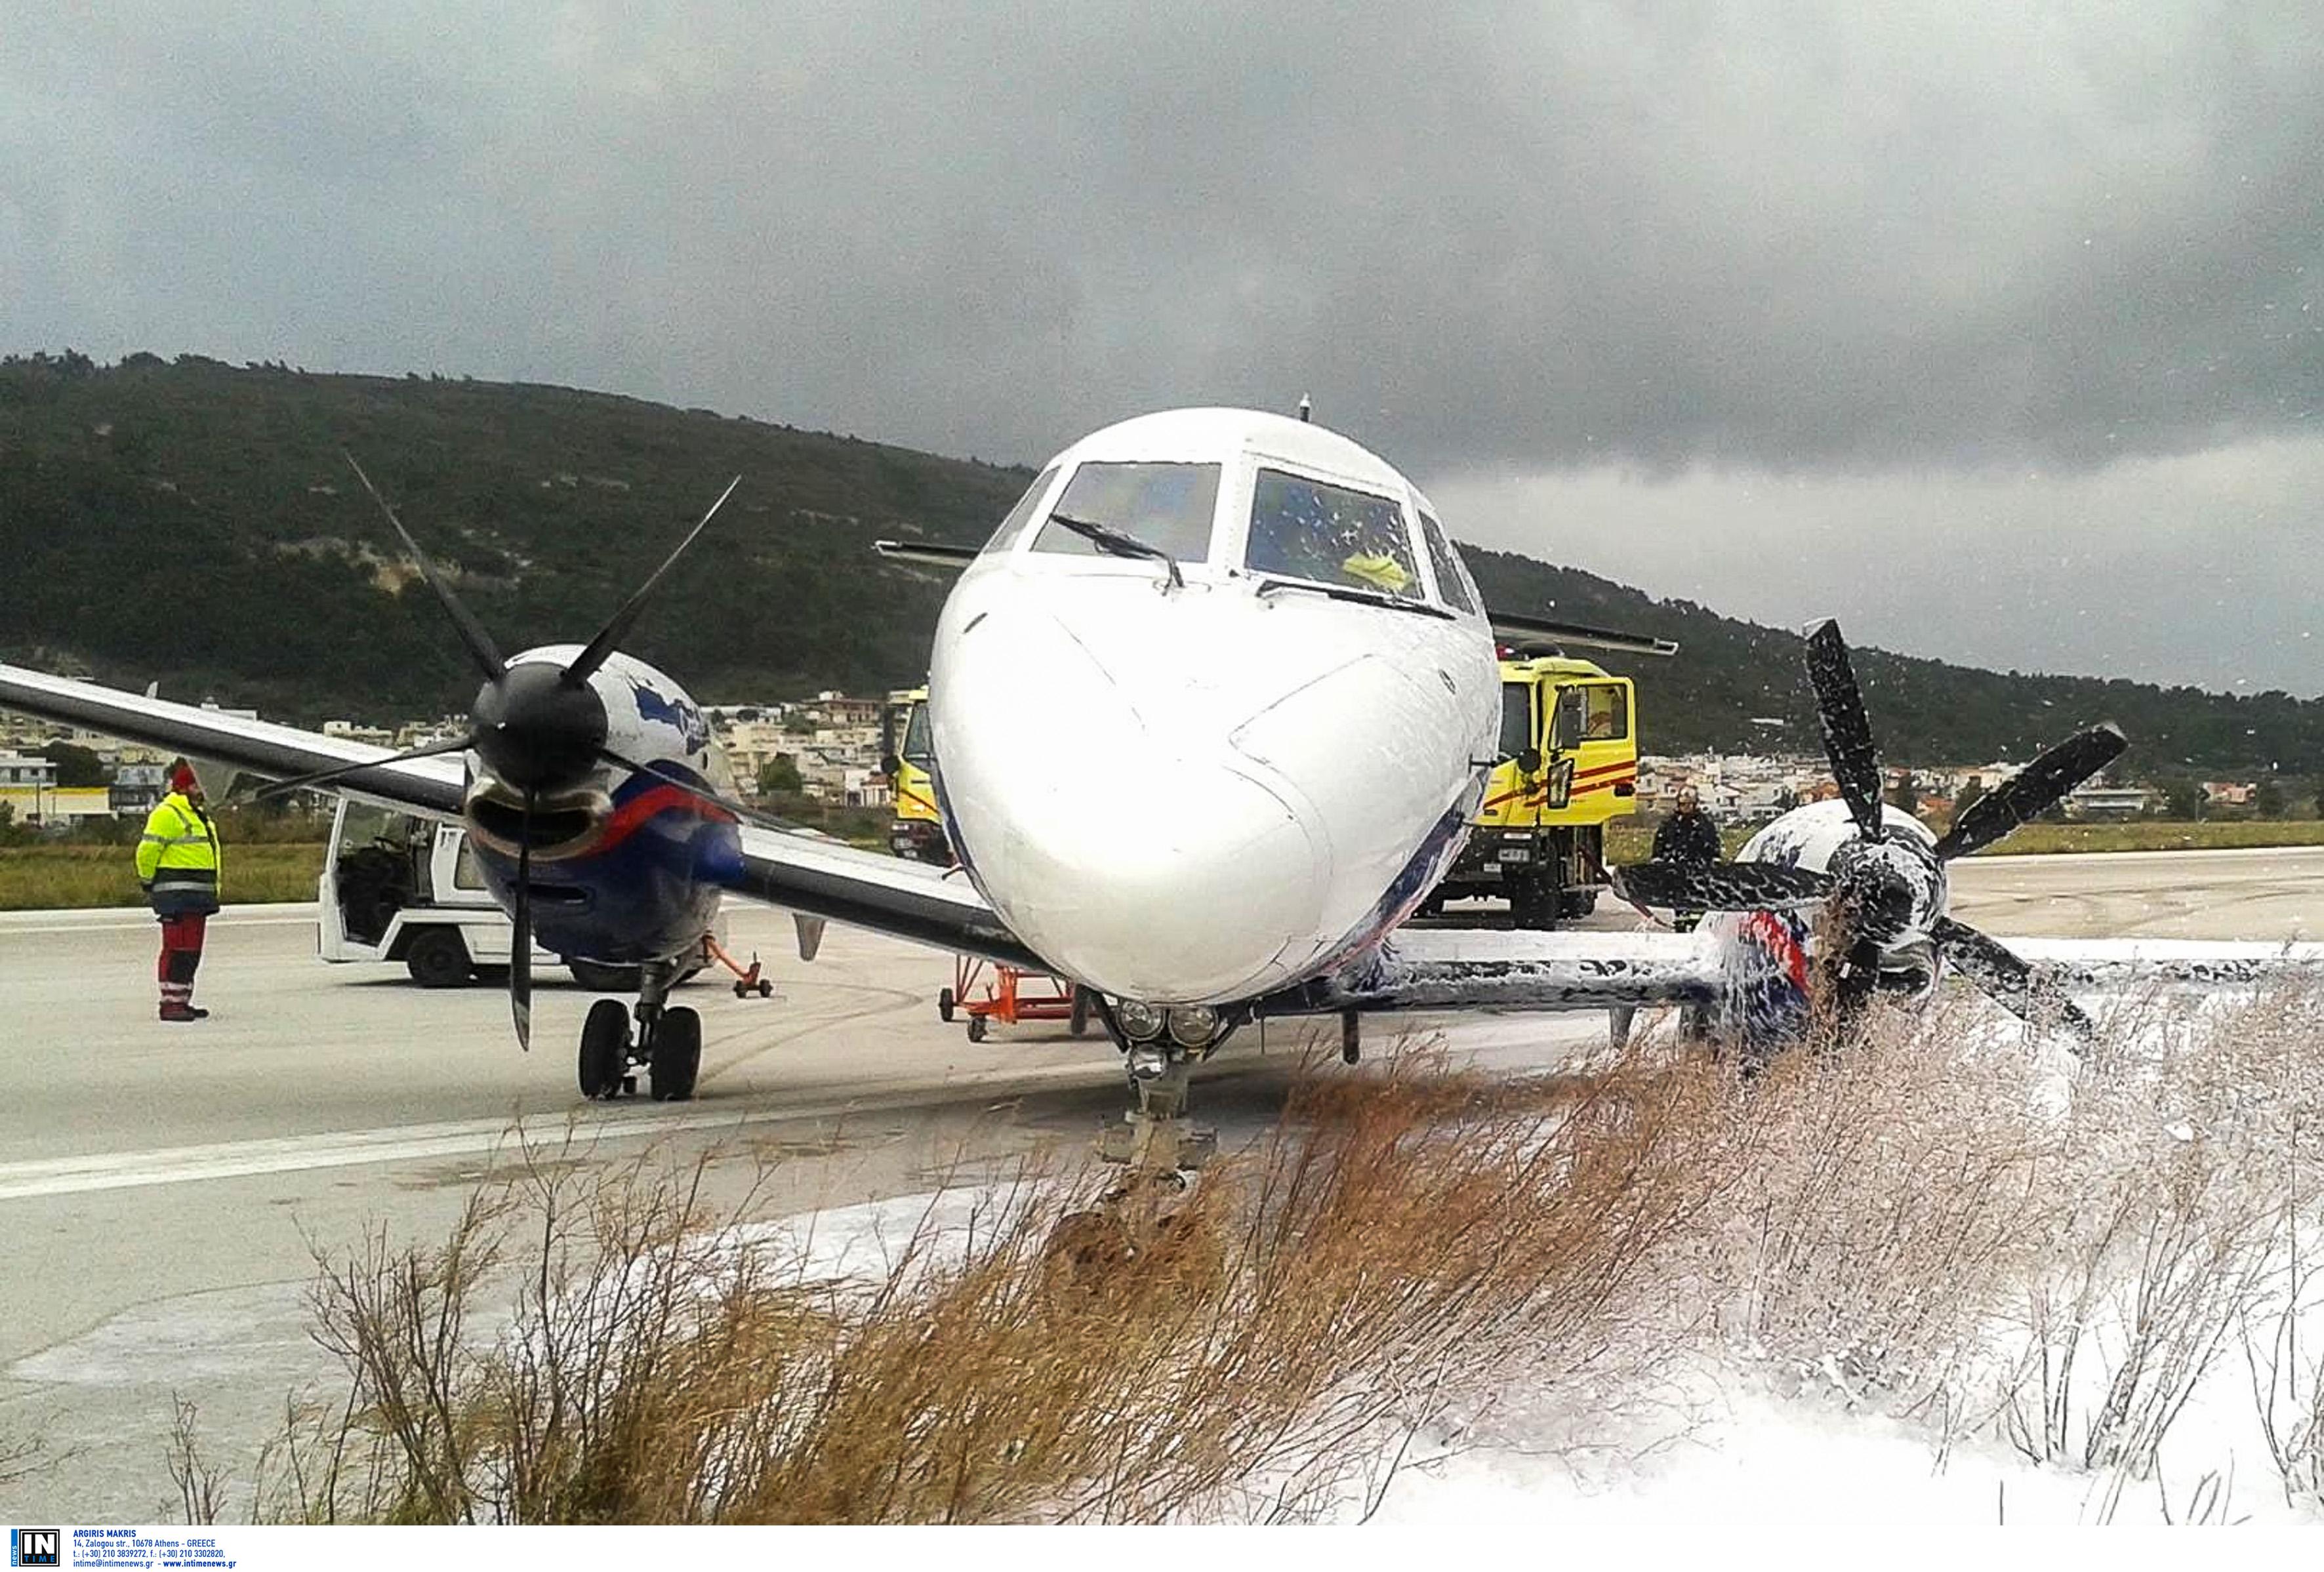 Sky Express: Άλλη μια πτήση τρόμου! Η νέα λαχτάρα των επιβατών και ο βαθύς ύπνος των αρμοδίων